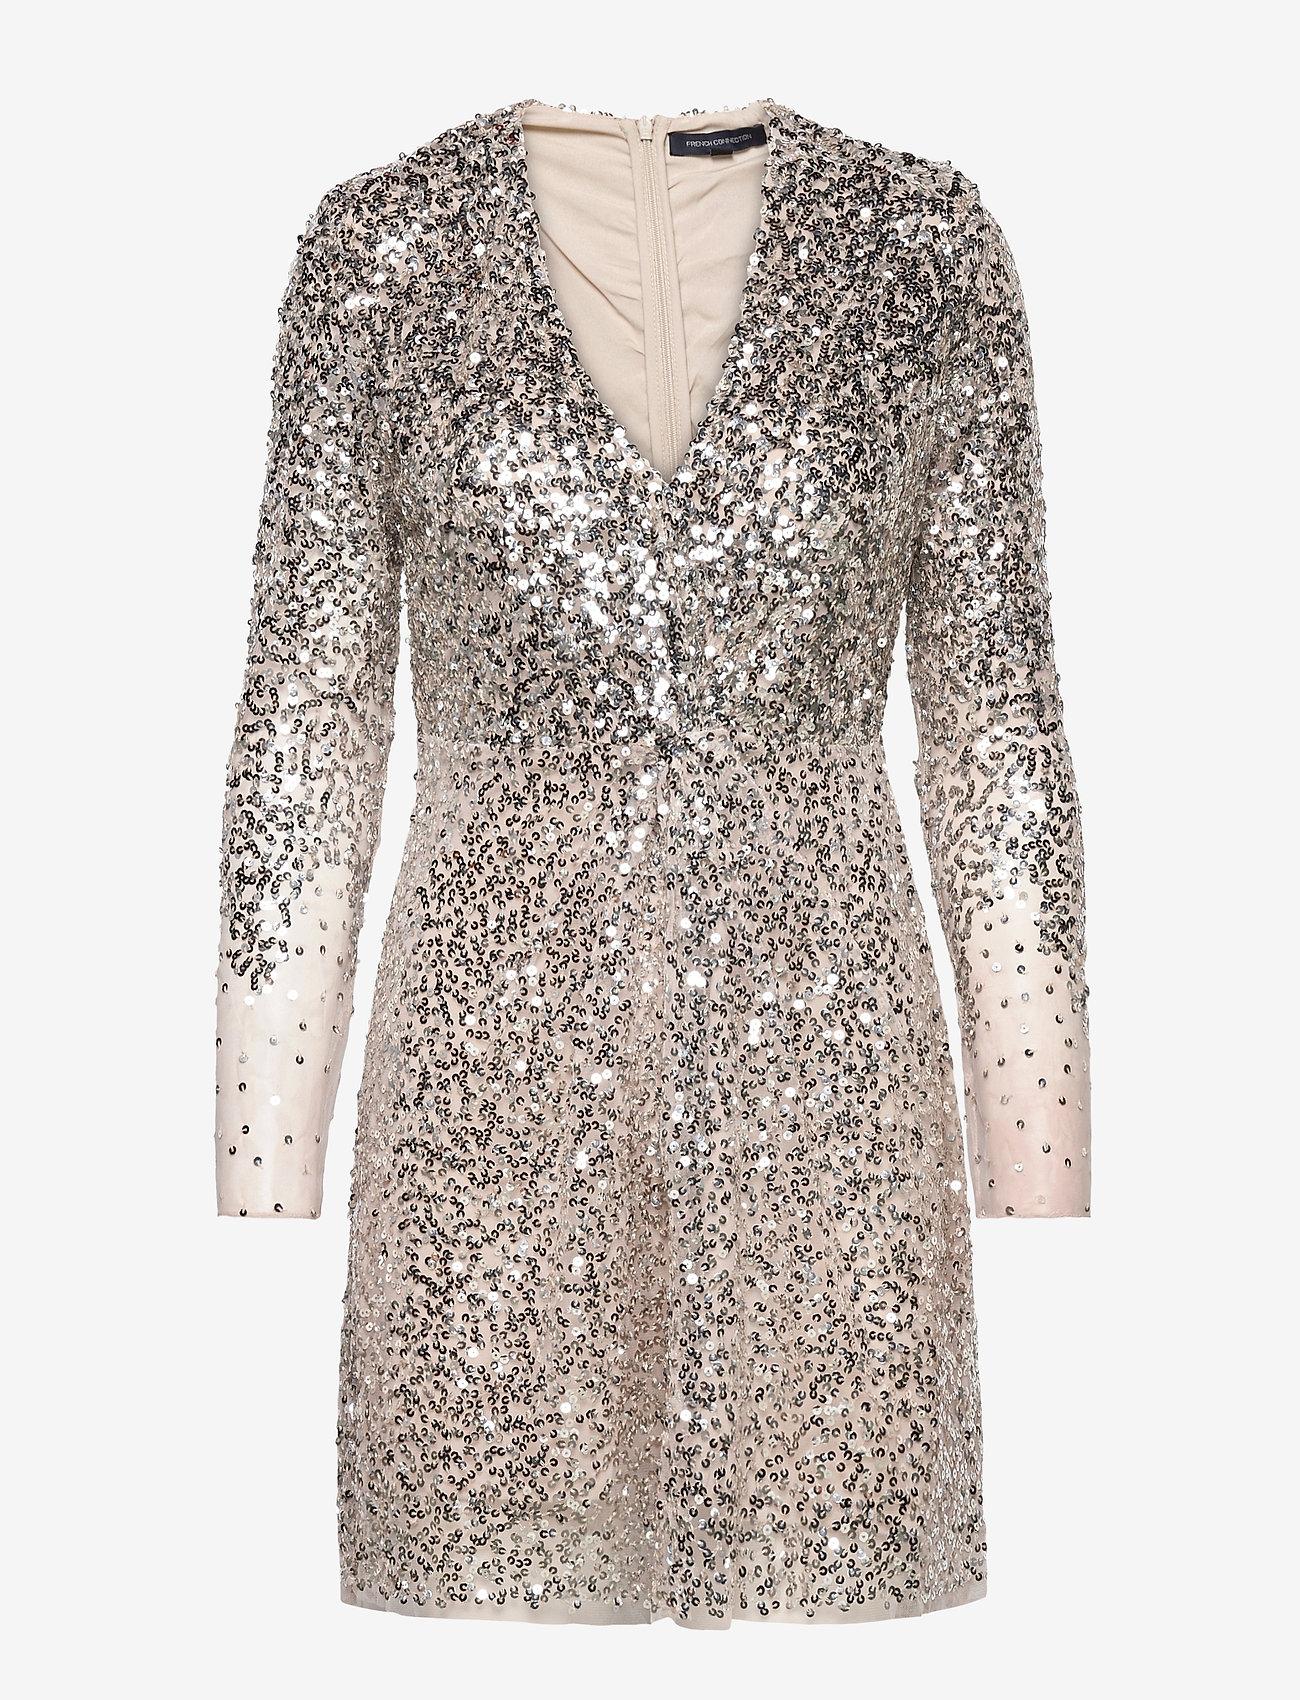 French Connection - EMILLE SPARKLE SHORT DRESS - paljettkjoler - silver/nude - 0